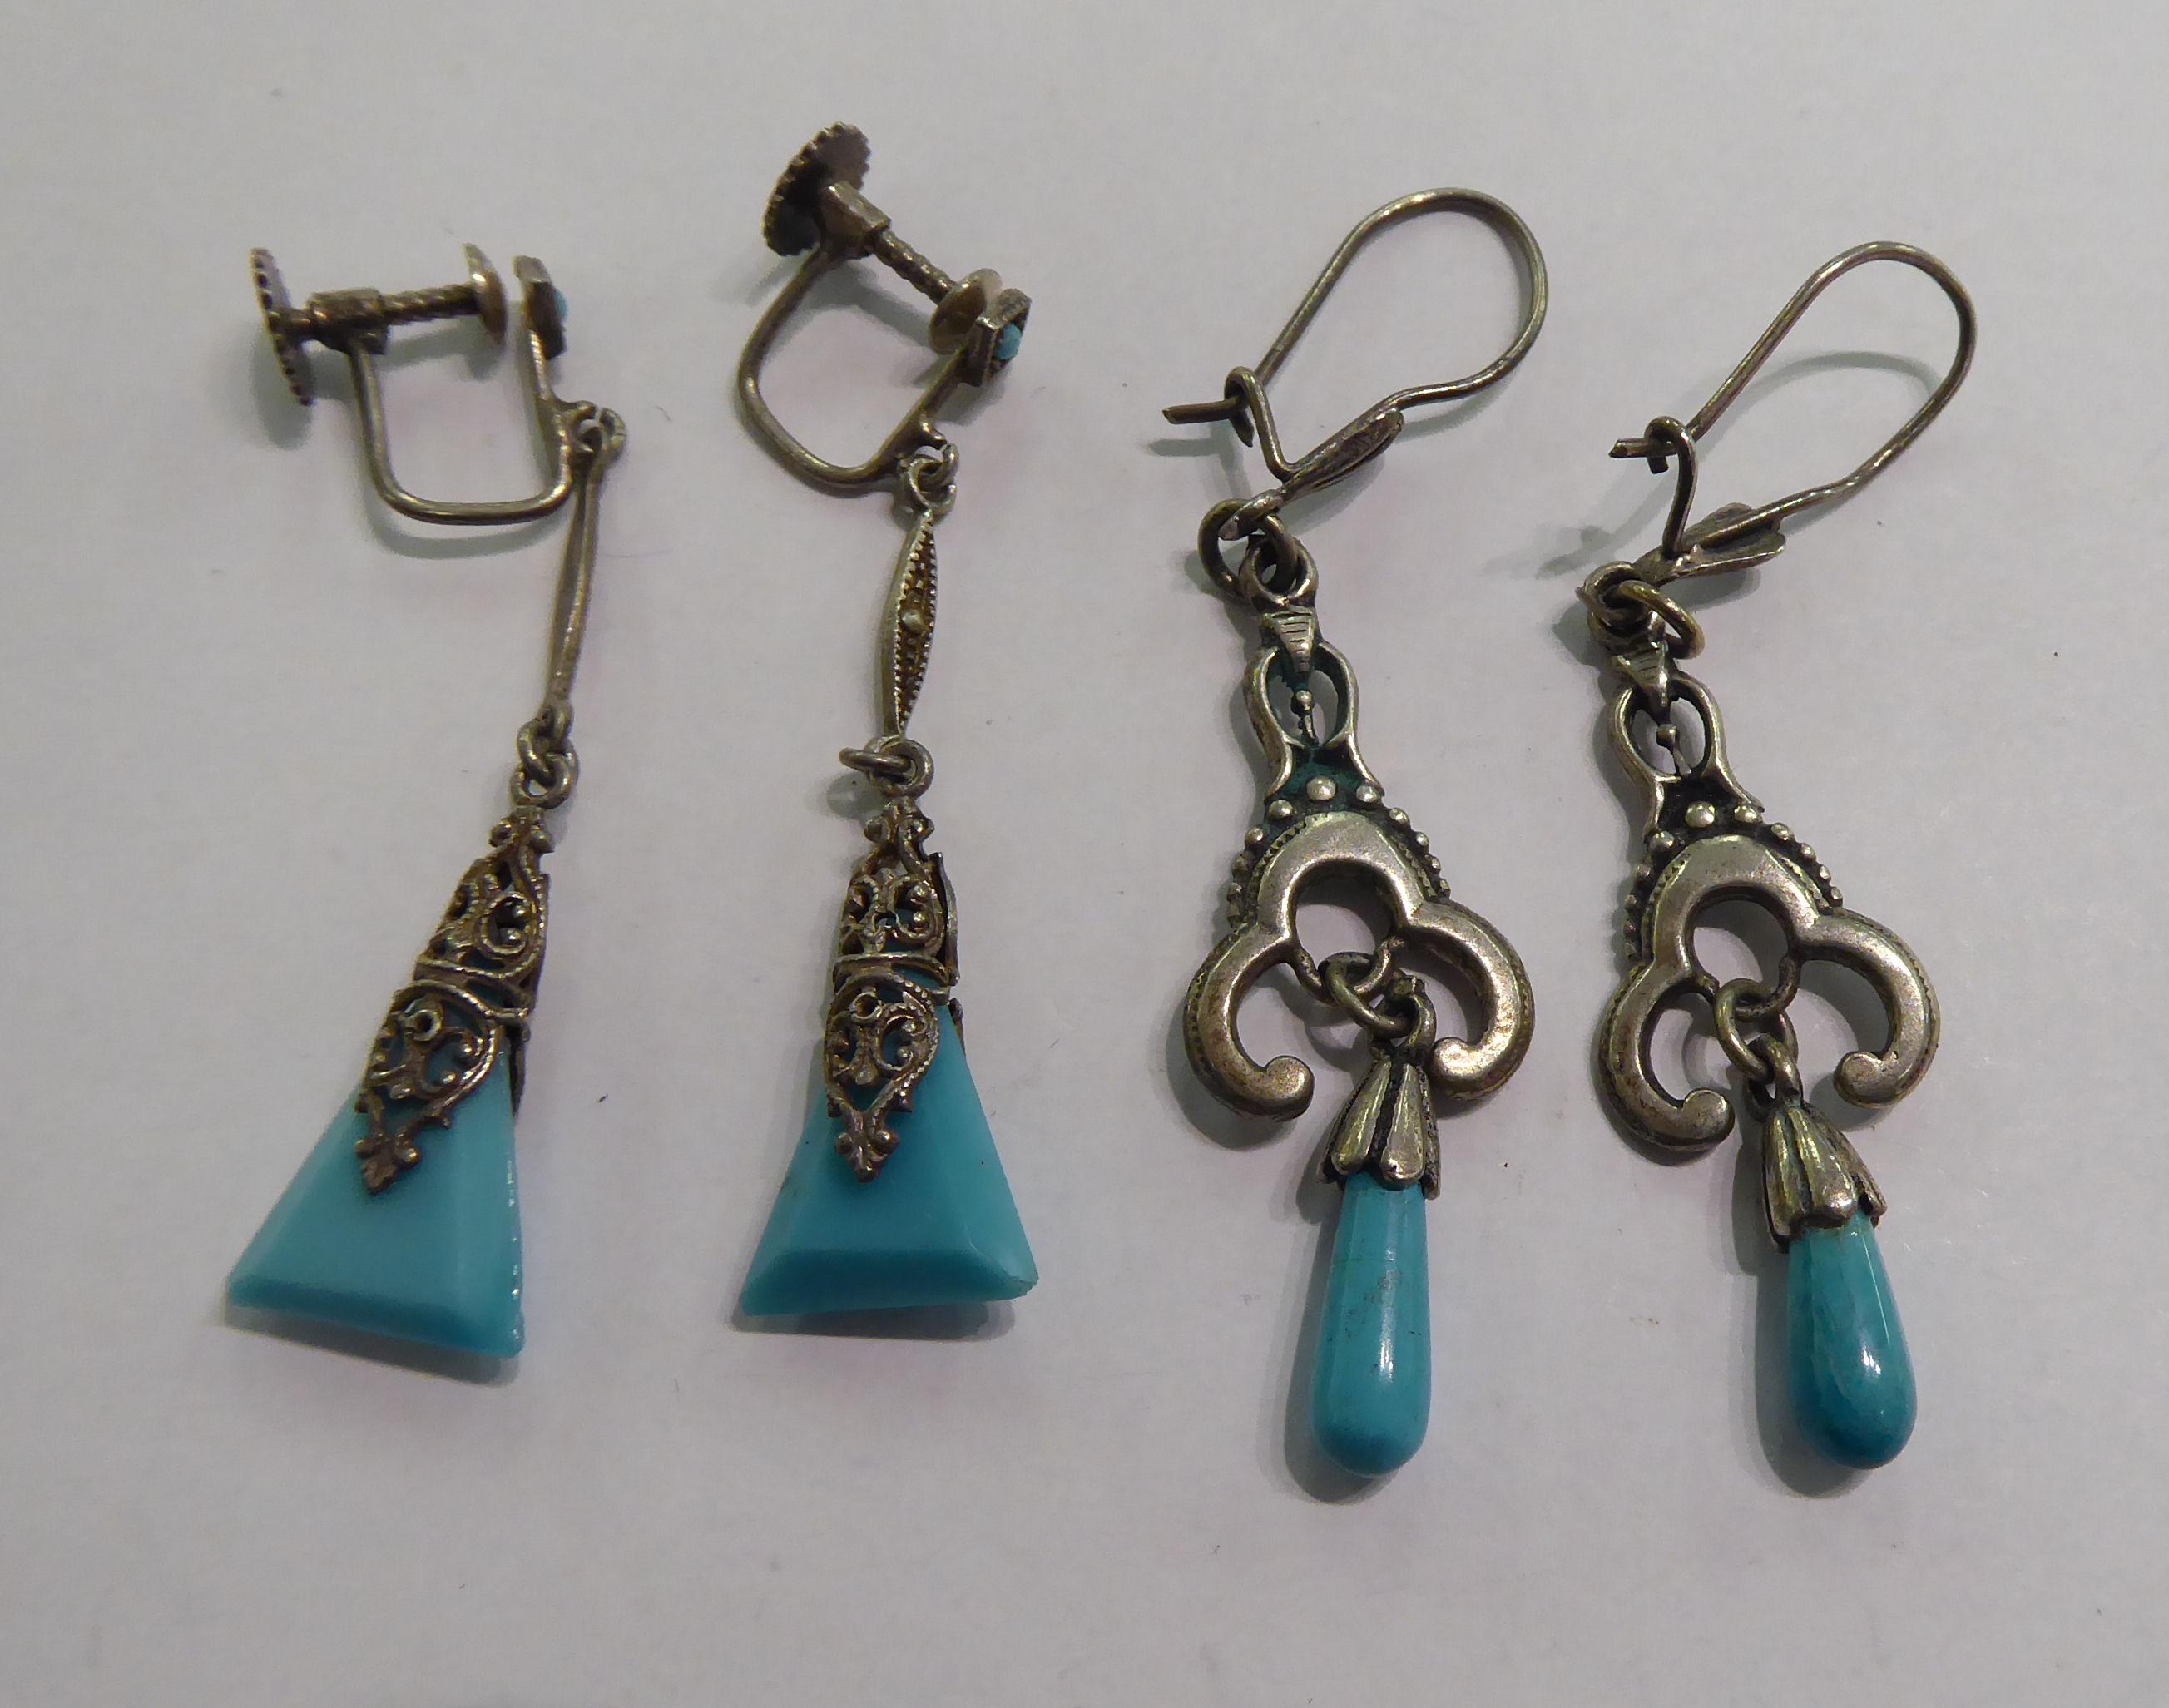 Lot 35 - Two similar pairs of white metal earrings,